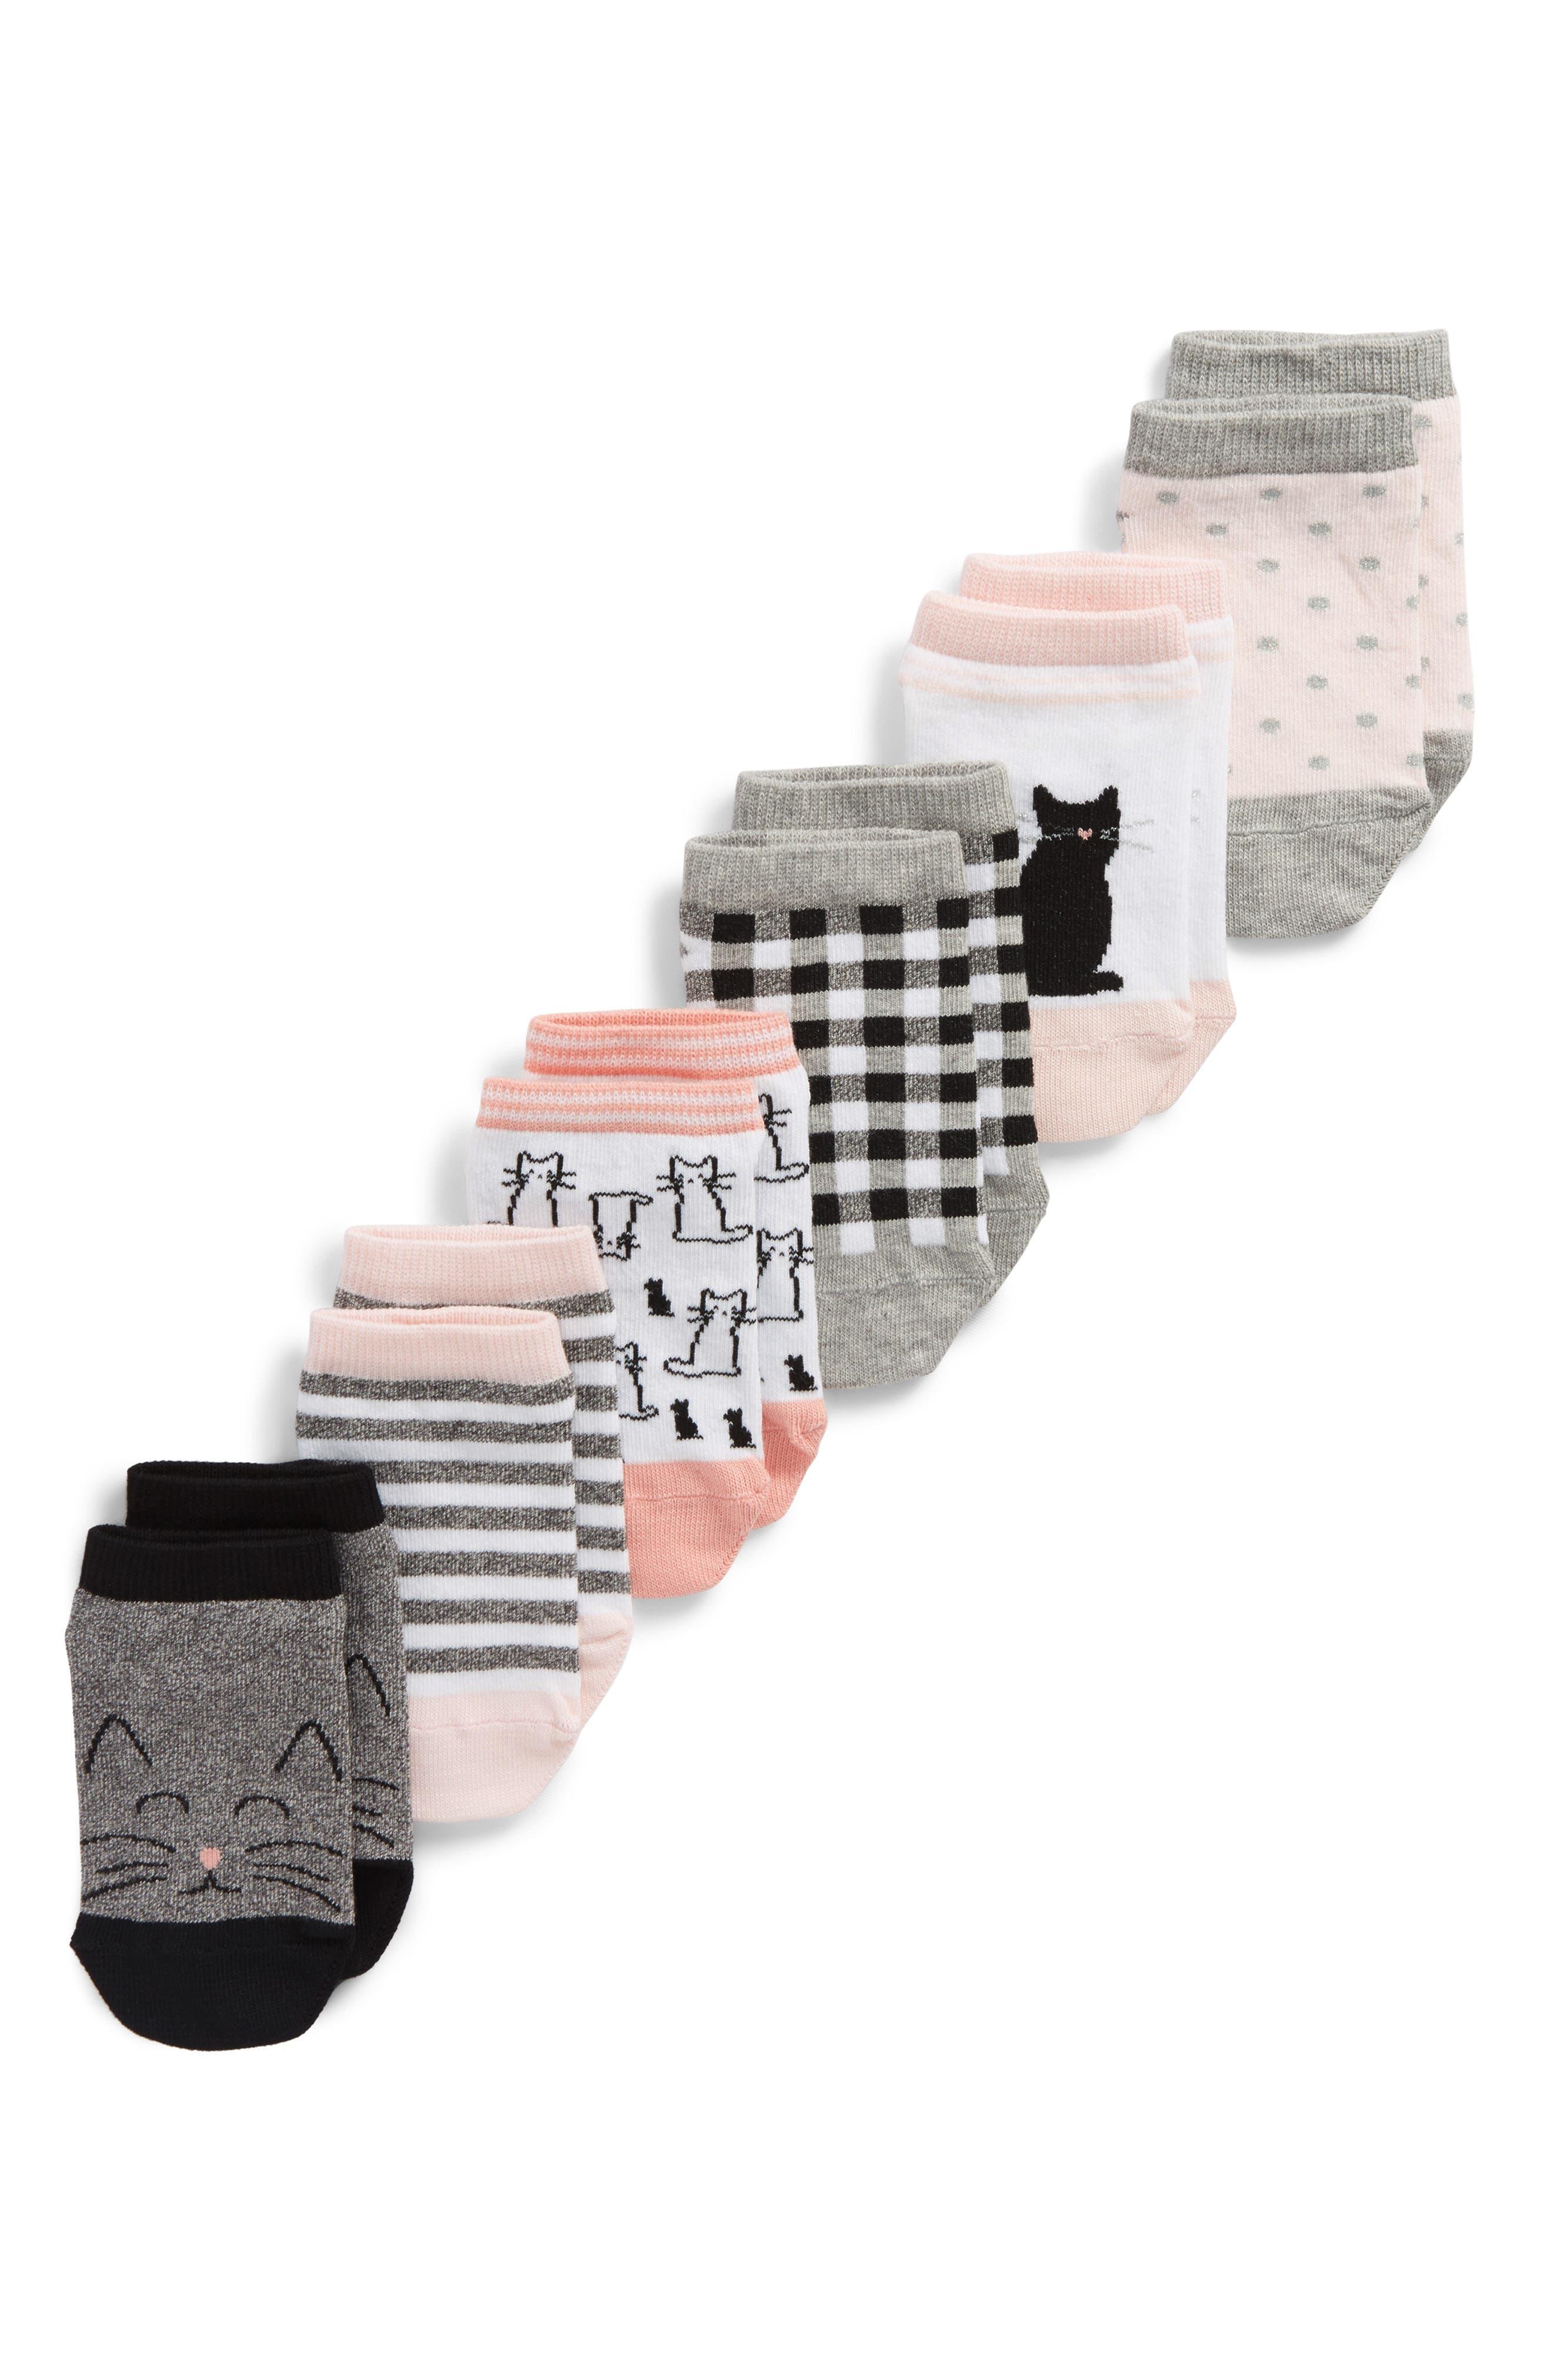 6-Pack Assorted Low Cut Socks,                         Main,                         color, Black Multi